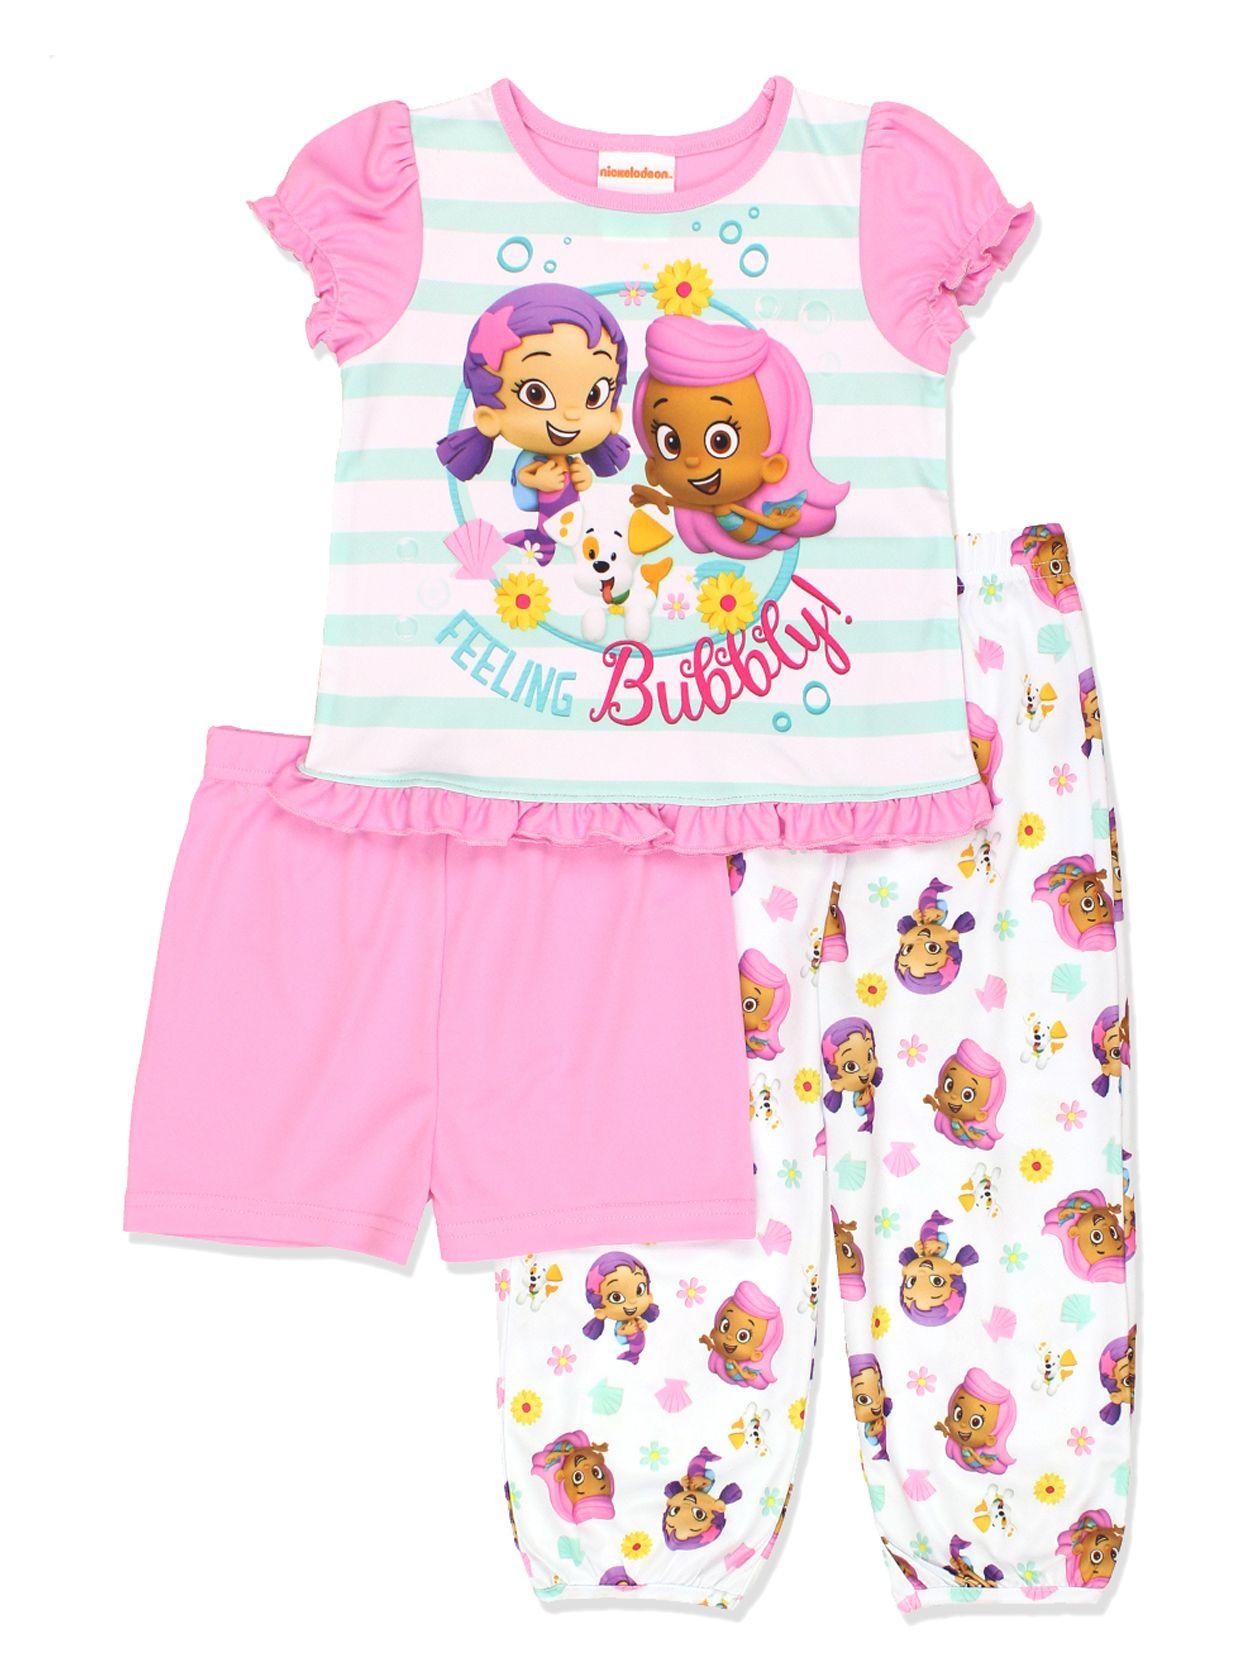 Bubble Guppies Toddler Girls 3 piece Pajamas Set 21NS023TZS